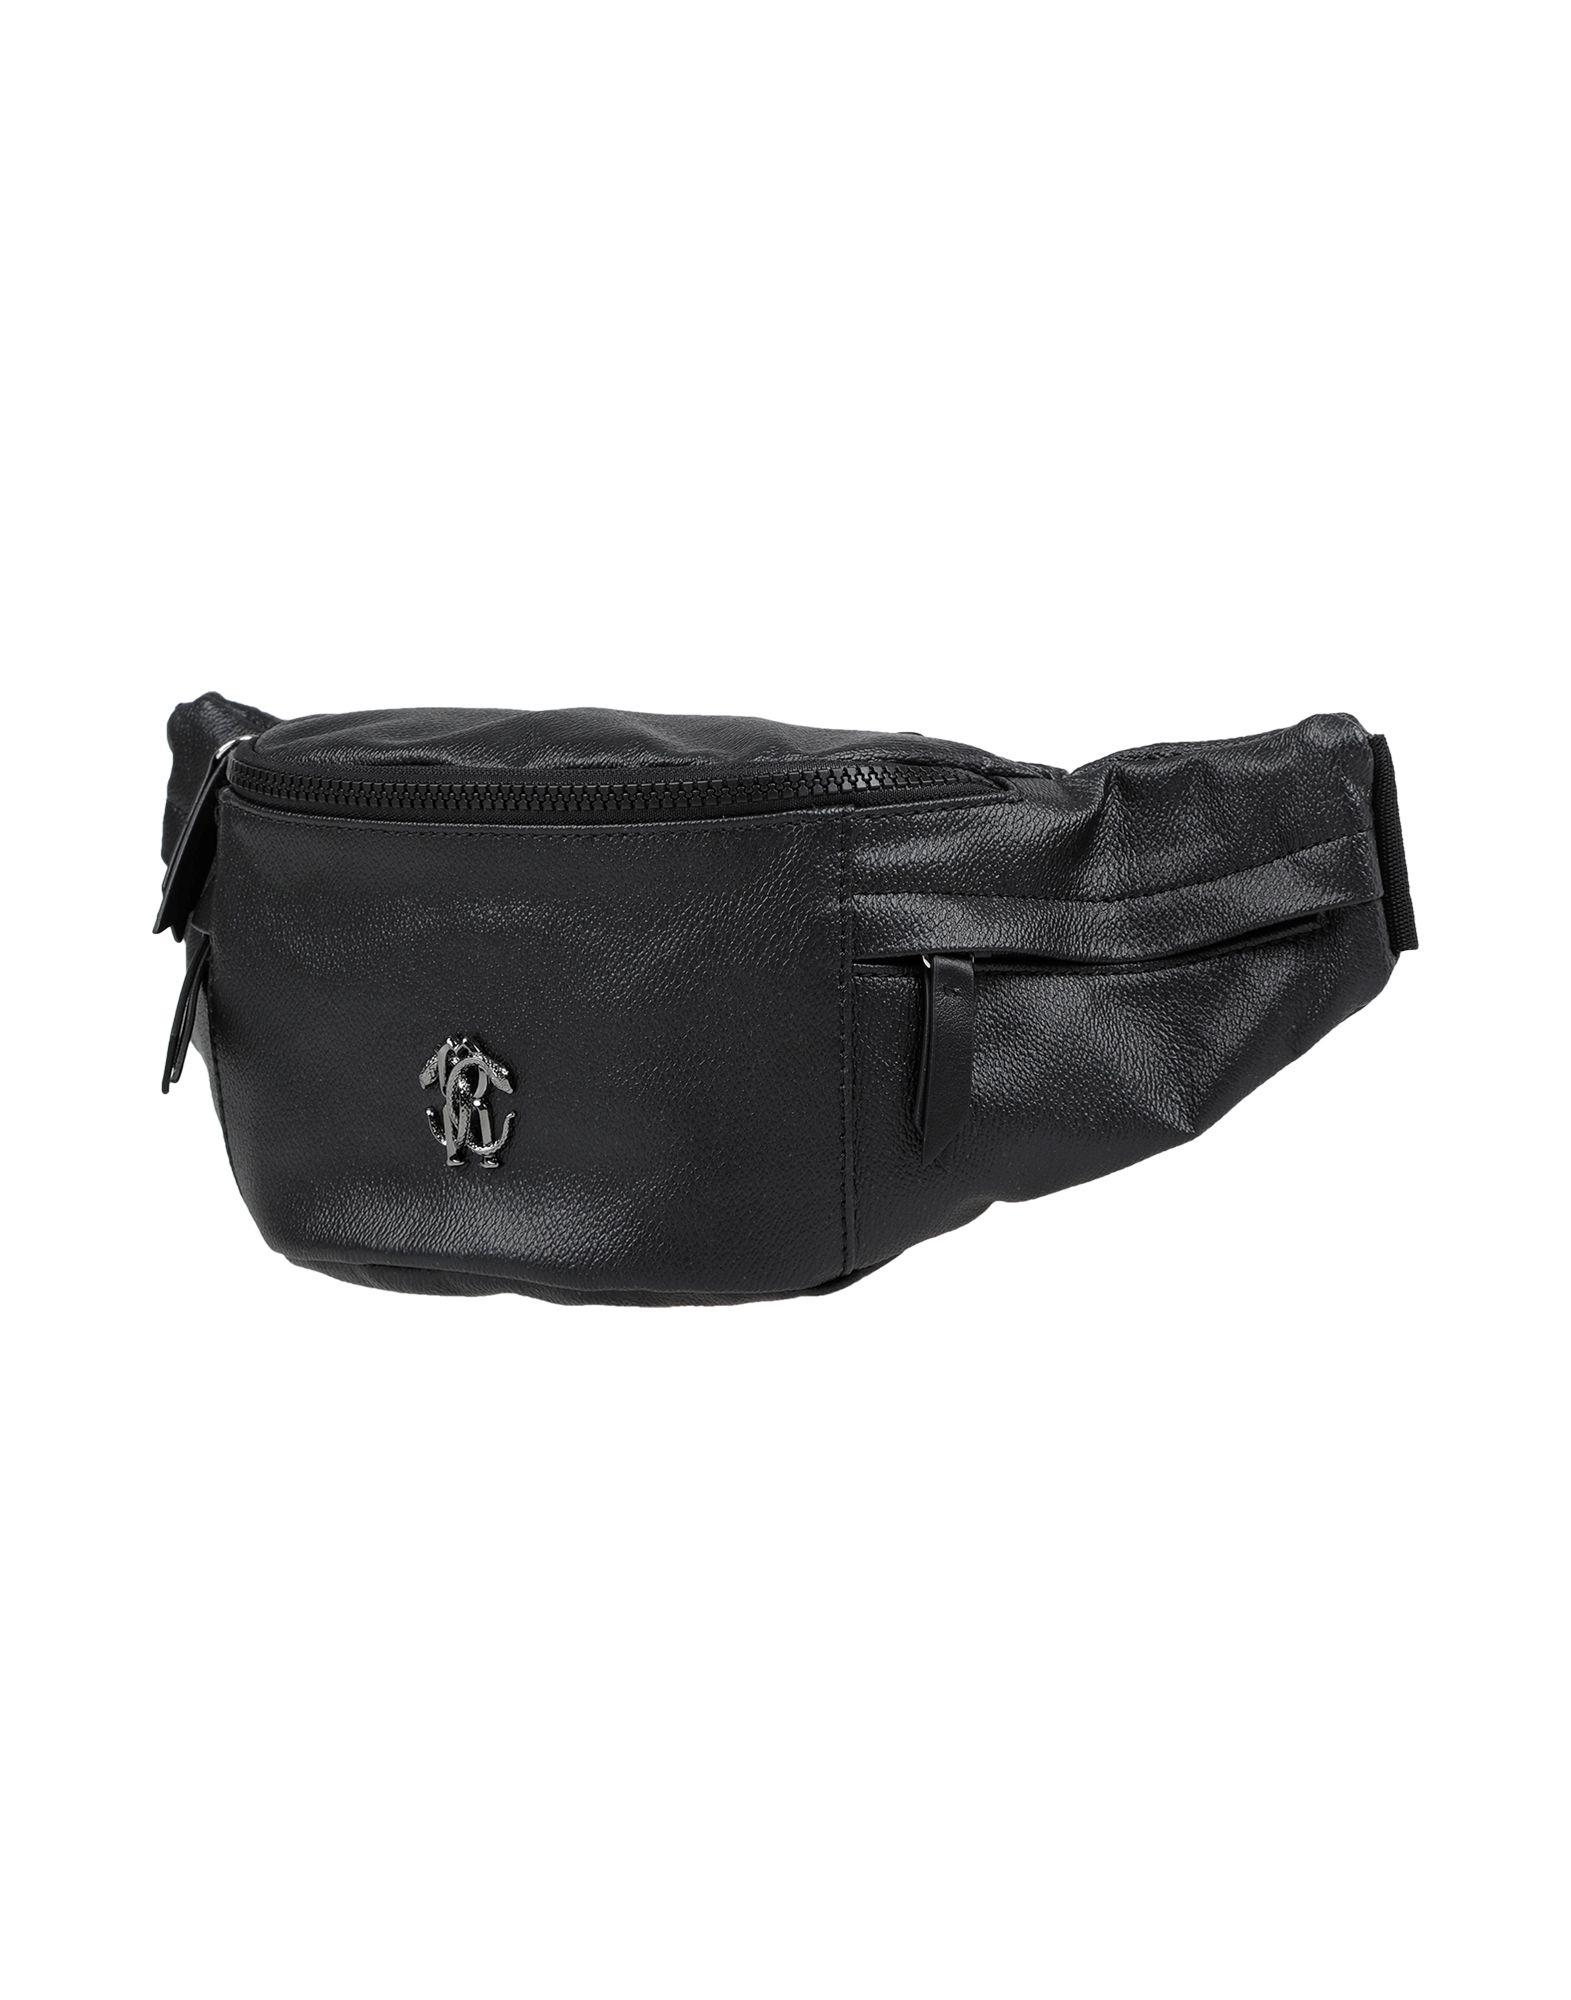 ROBERTO CAVALLI Рюкзаки и сумки на пояс сумки magnolia сумка женская a761 7363 лак искусственная кожа page 8